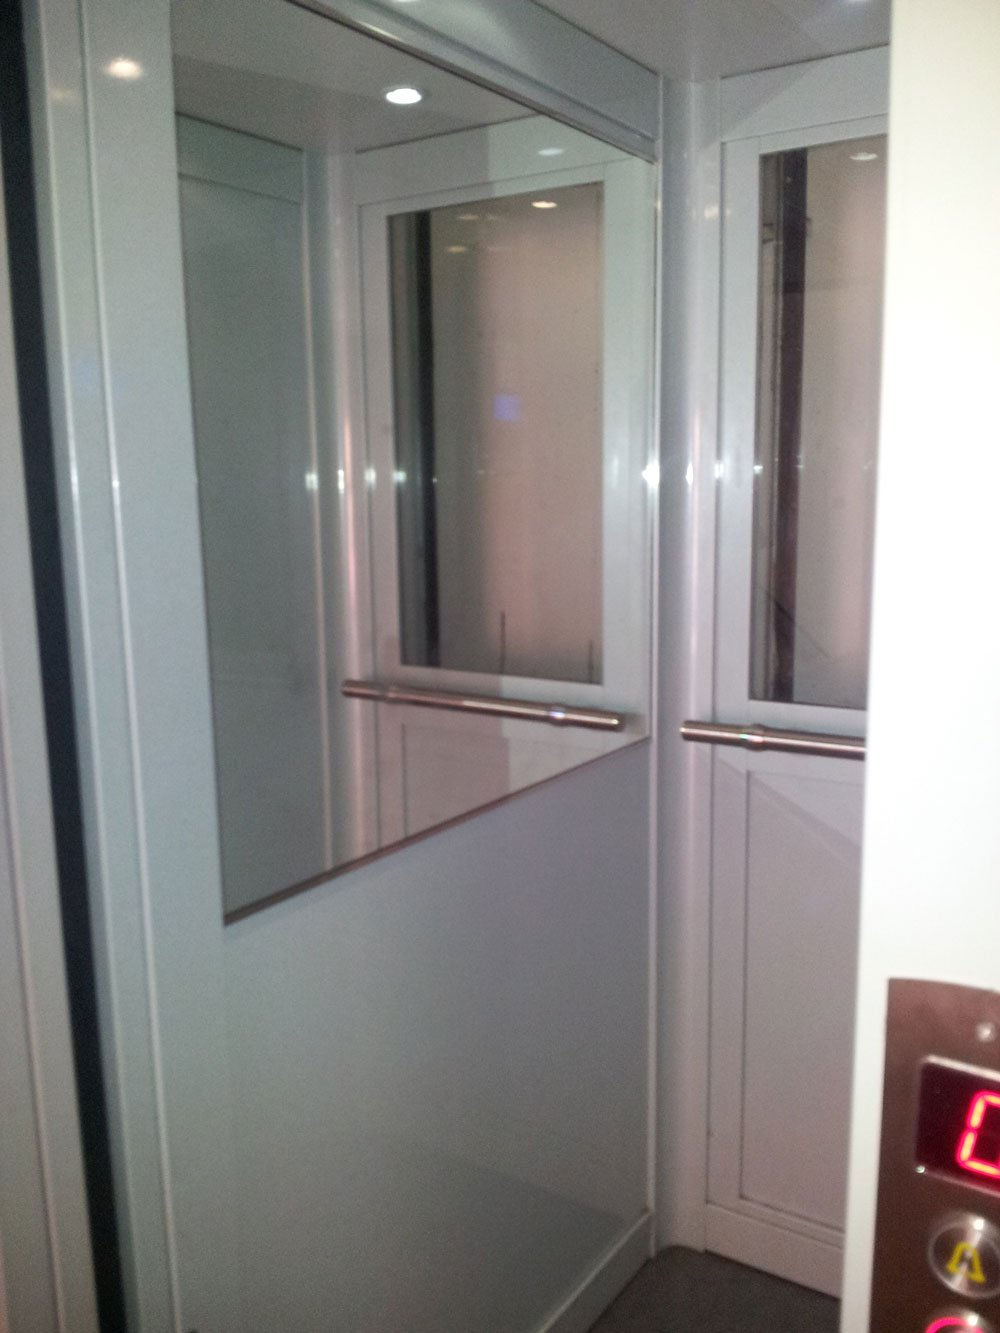 Ascensori panoramici ascensori per disabili Cabine per